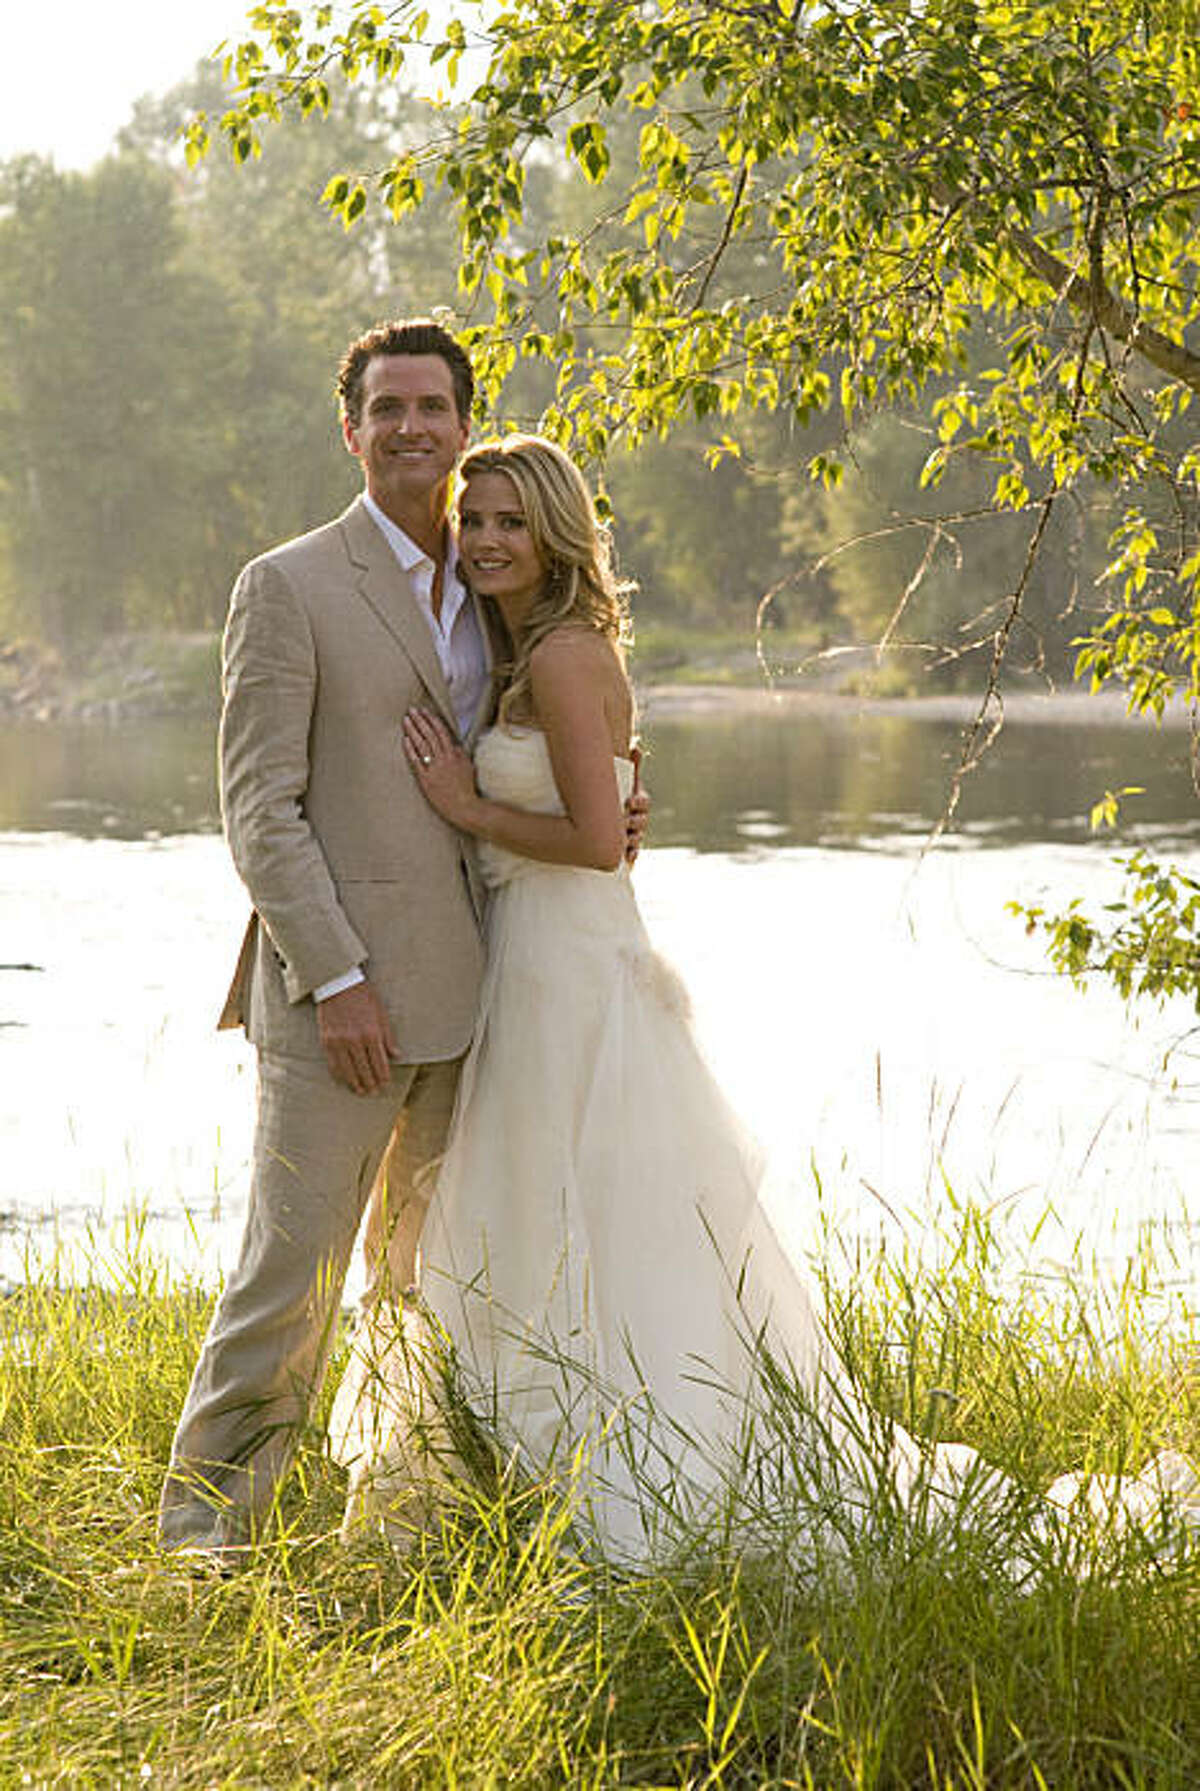 Mayor Gavin Newsom and his bride Jennifer Siebel at their wedding location in Montana.